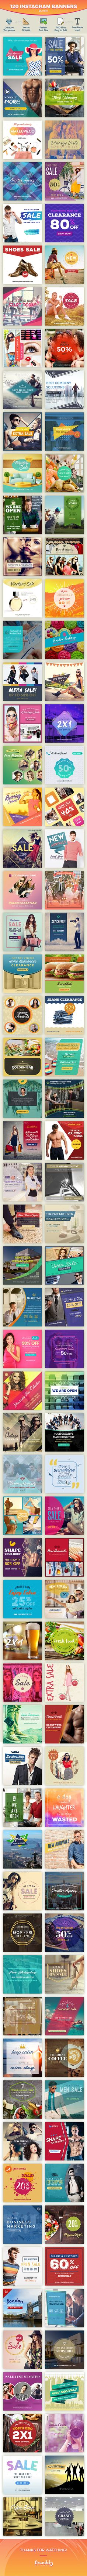 Instagram Banners Bundle PSD Template • Download ➝ https://graphicriver.net/item/instagram-banners-bundle/15221461?ref=pxcr